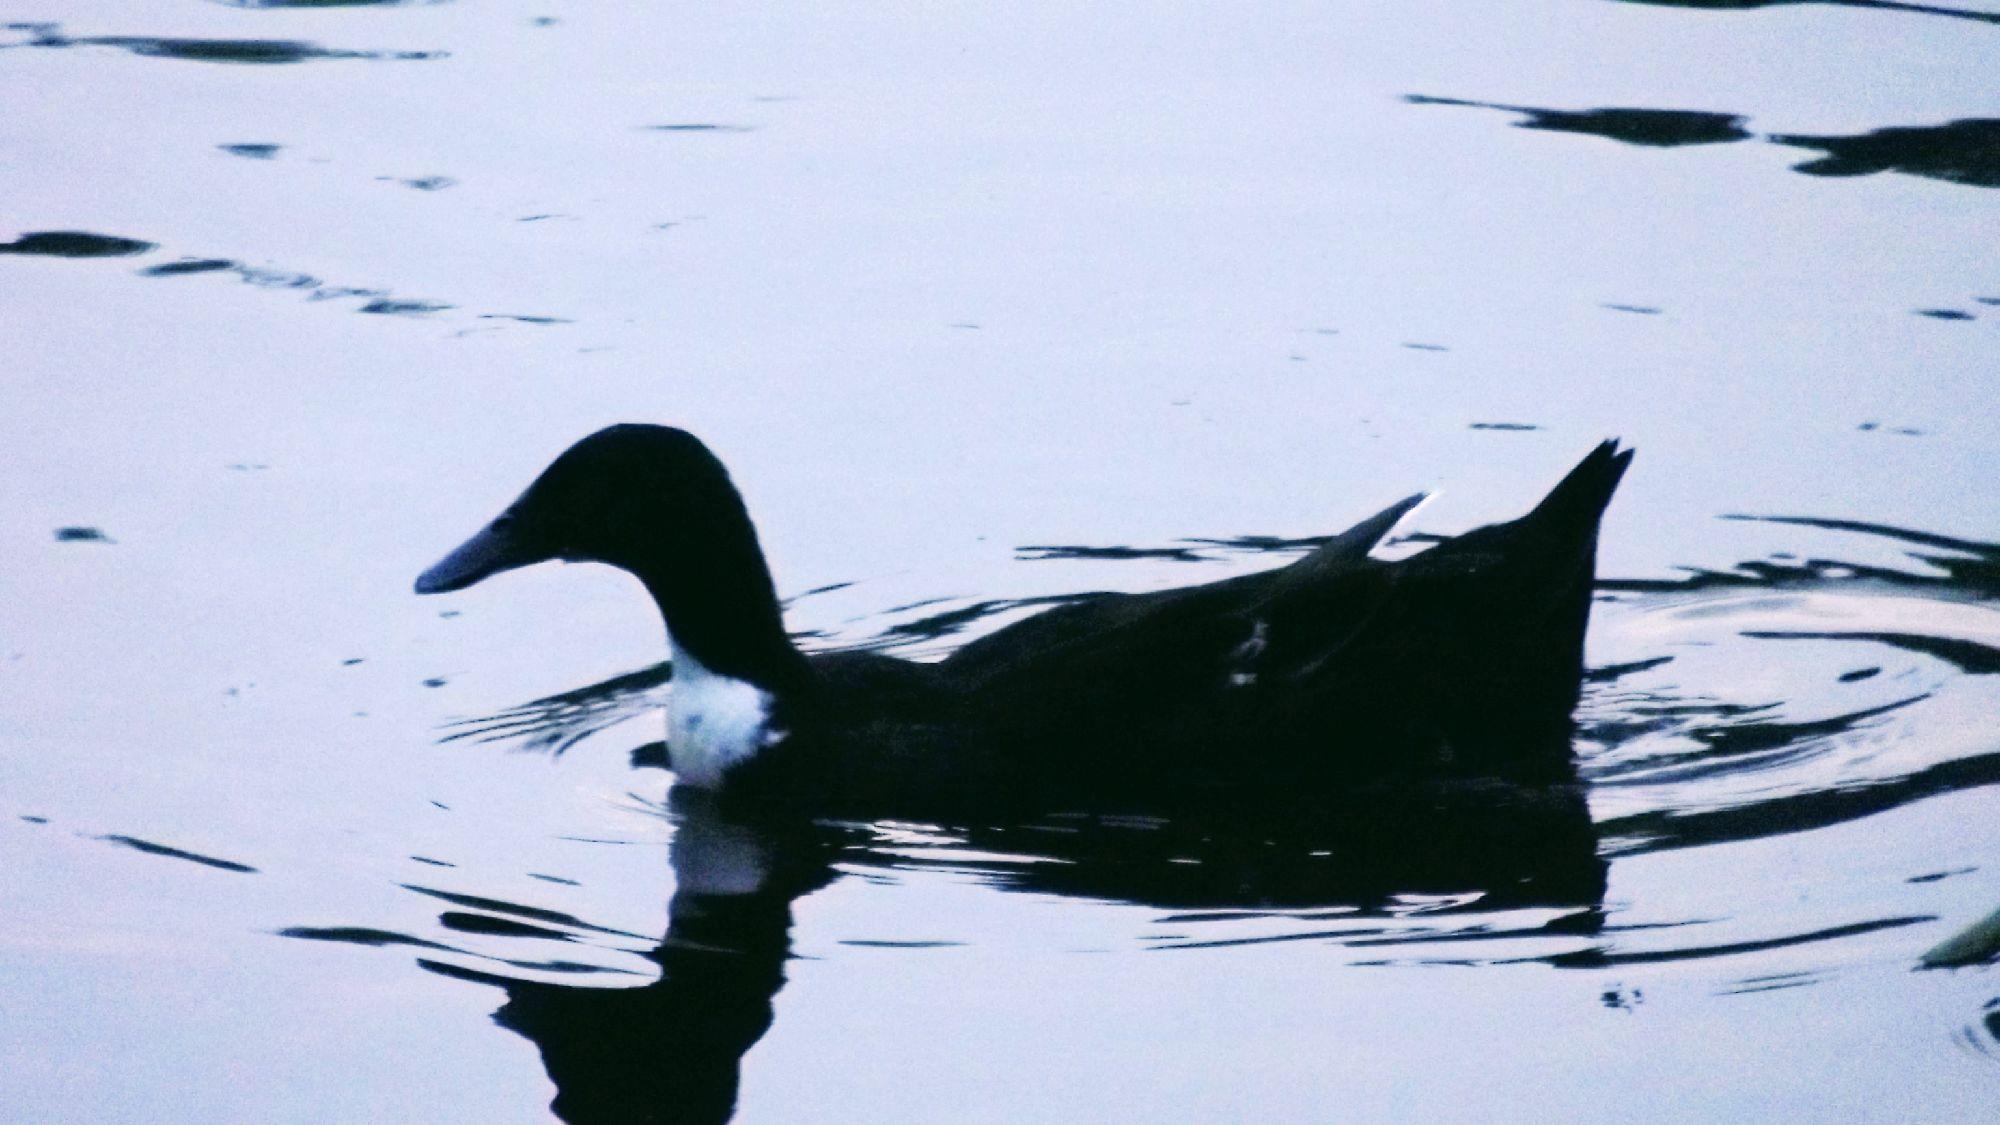 Селезень чёрной кряквы (Anas zonorhyncha)